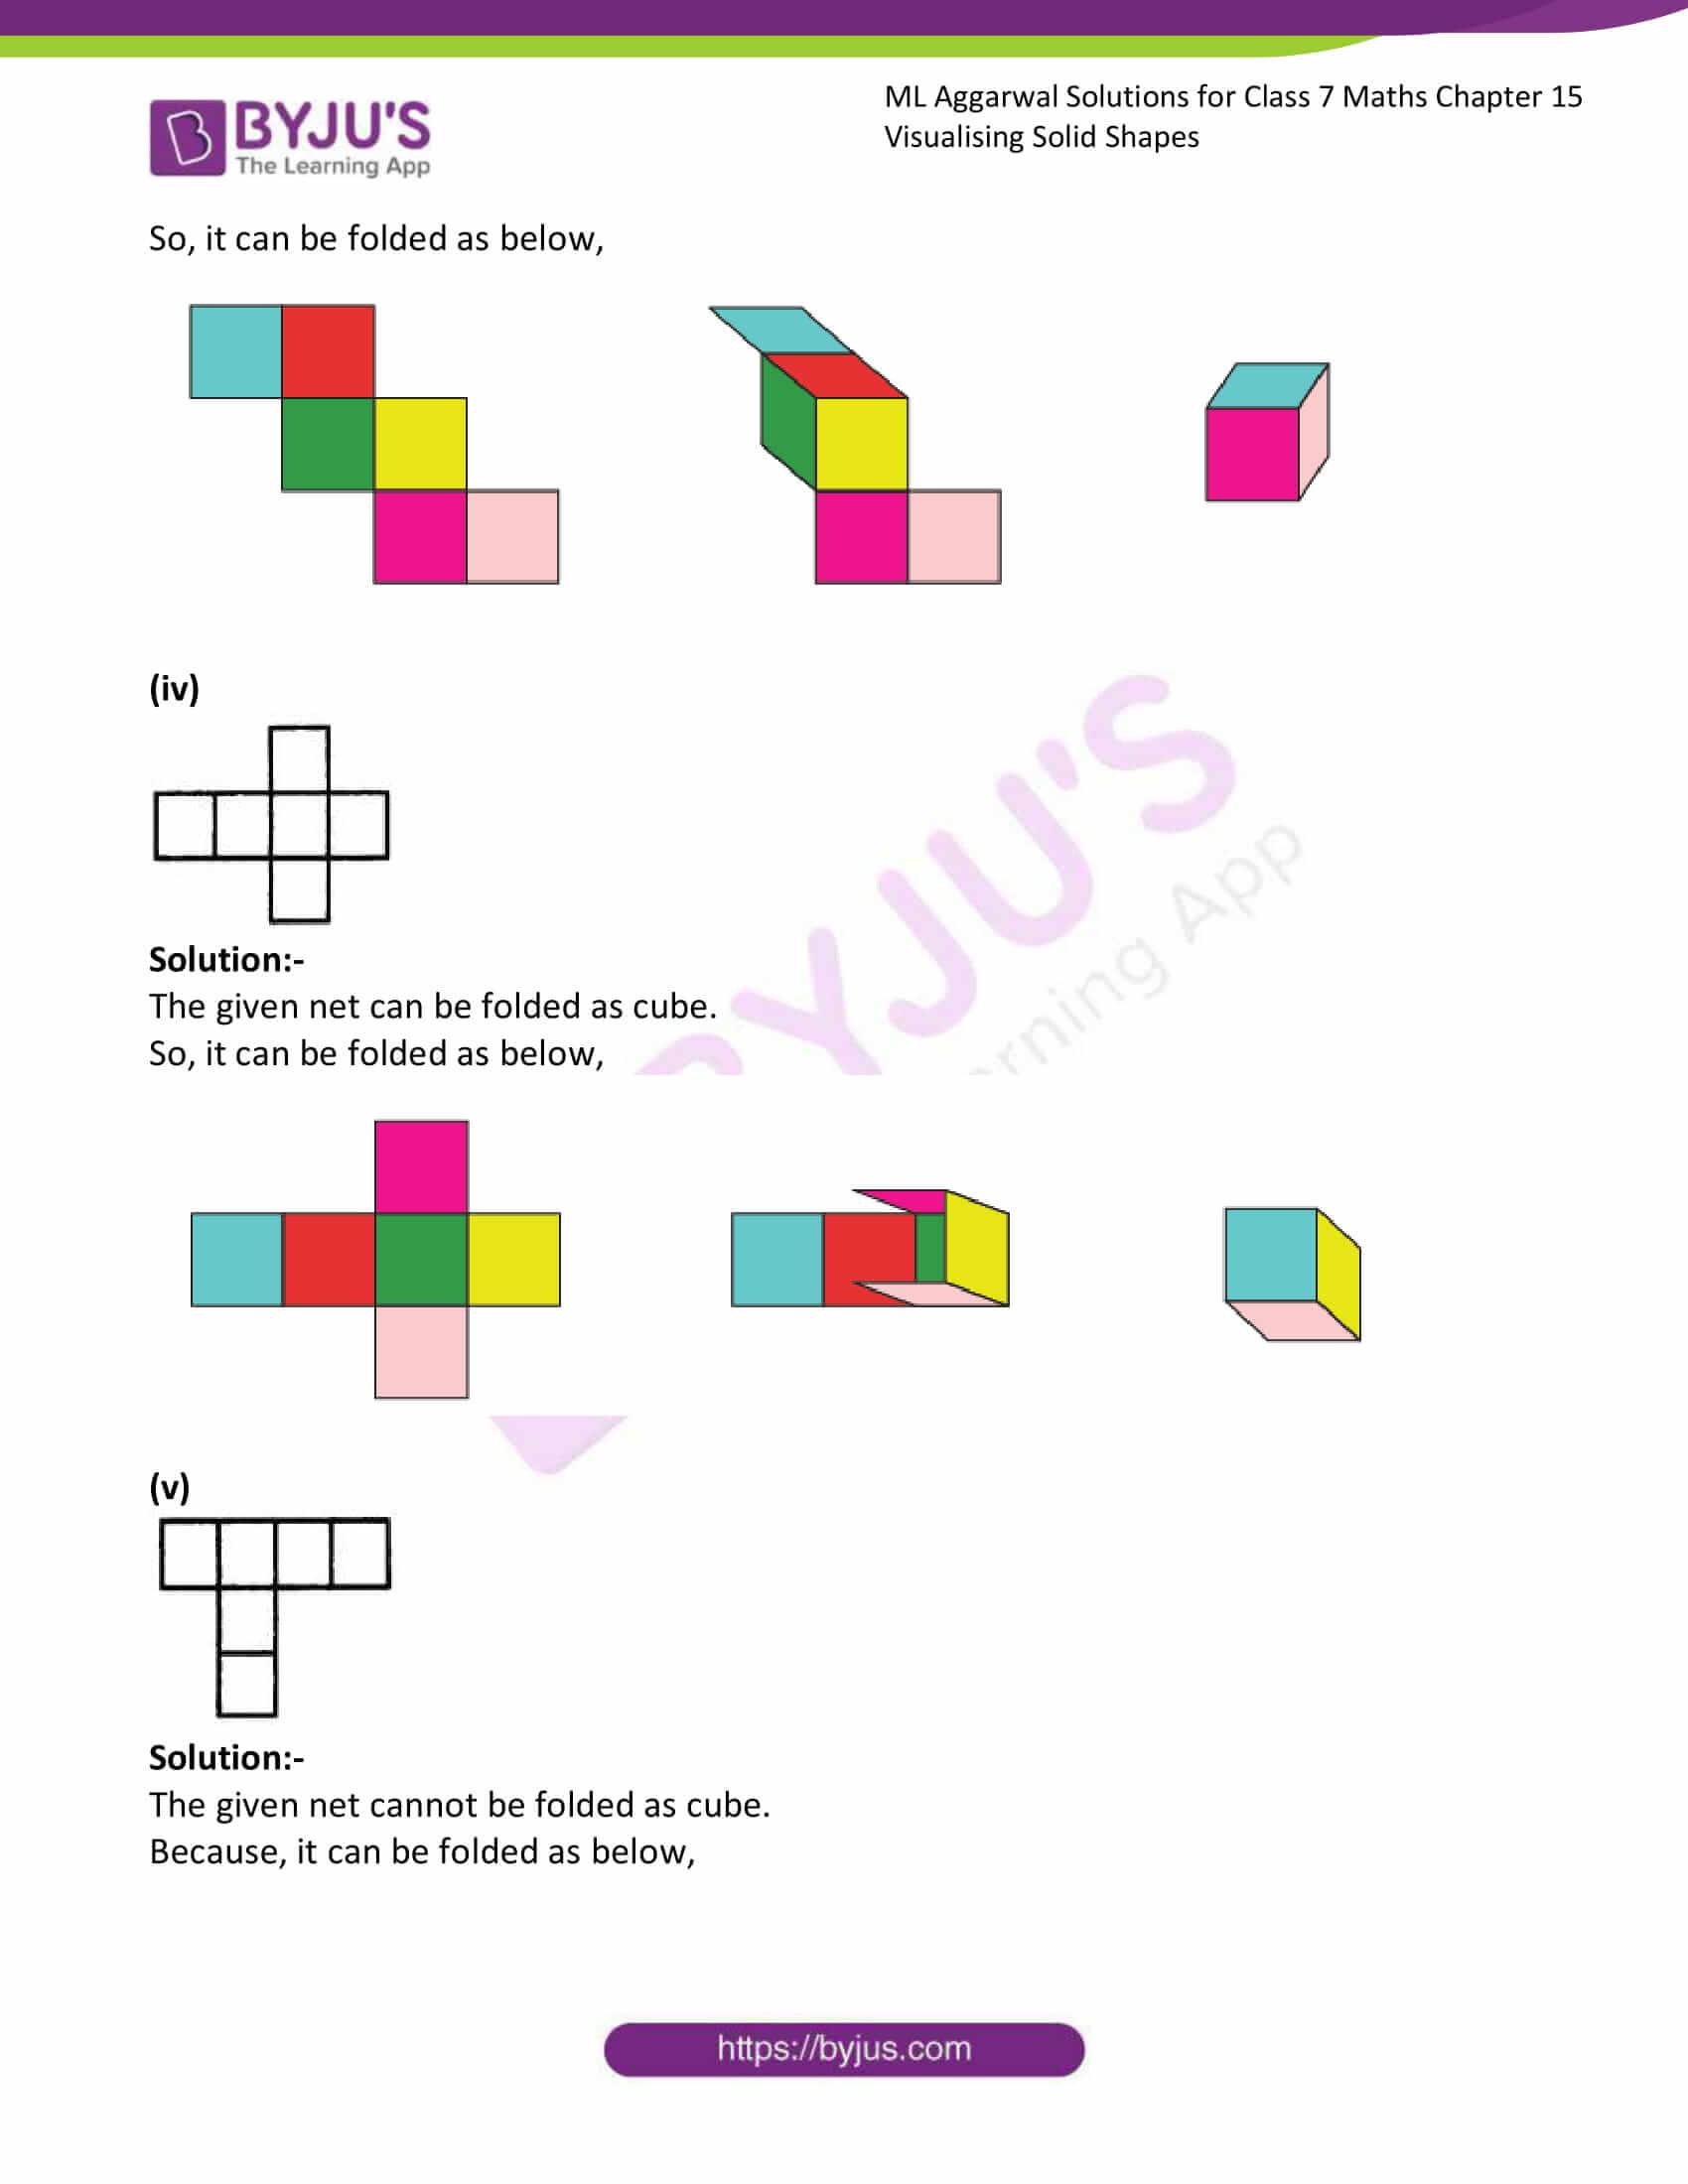 ml aggarwal sol class 7 maths chapter 15 4